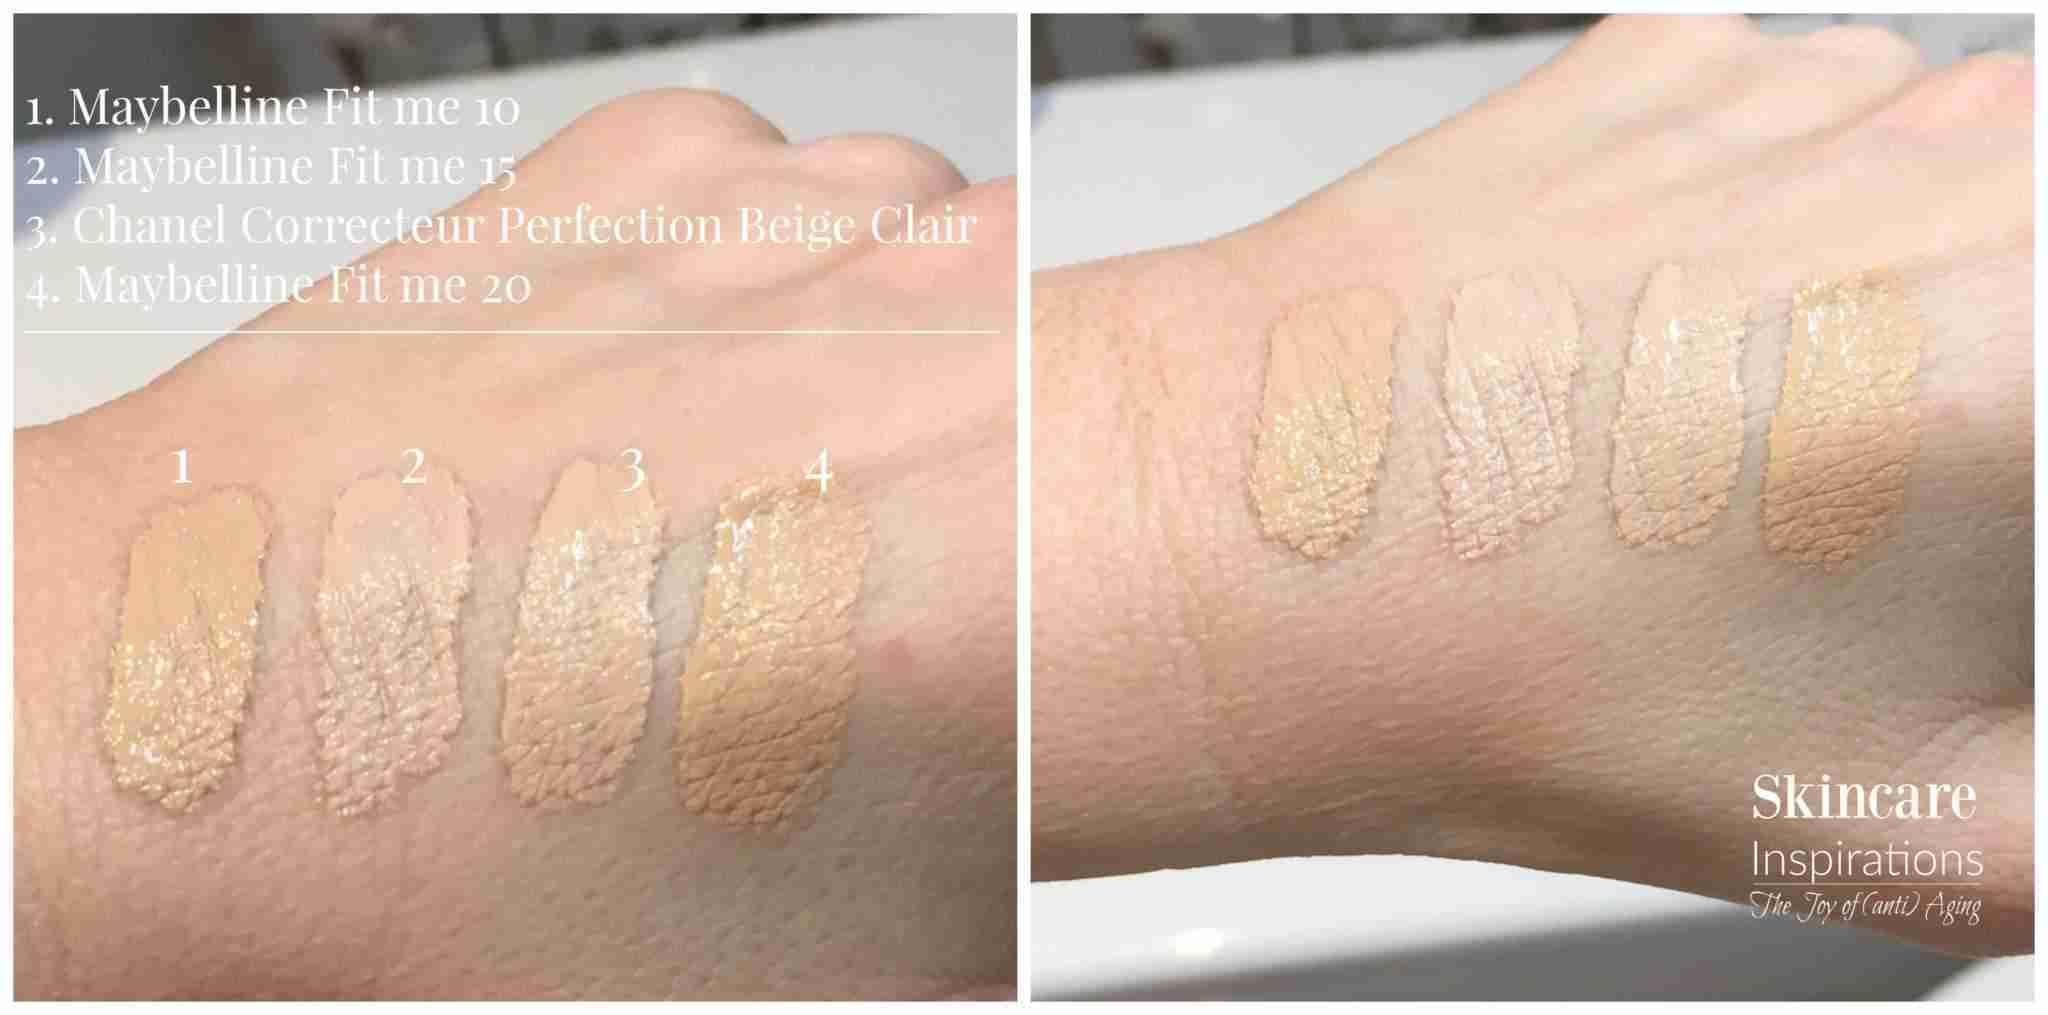 Maybelline Fit me Concealer swatches versus Chanel Correcteur Perfection Concealer